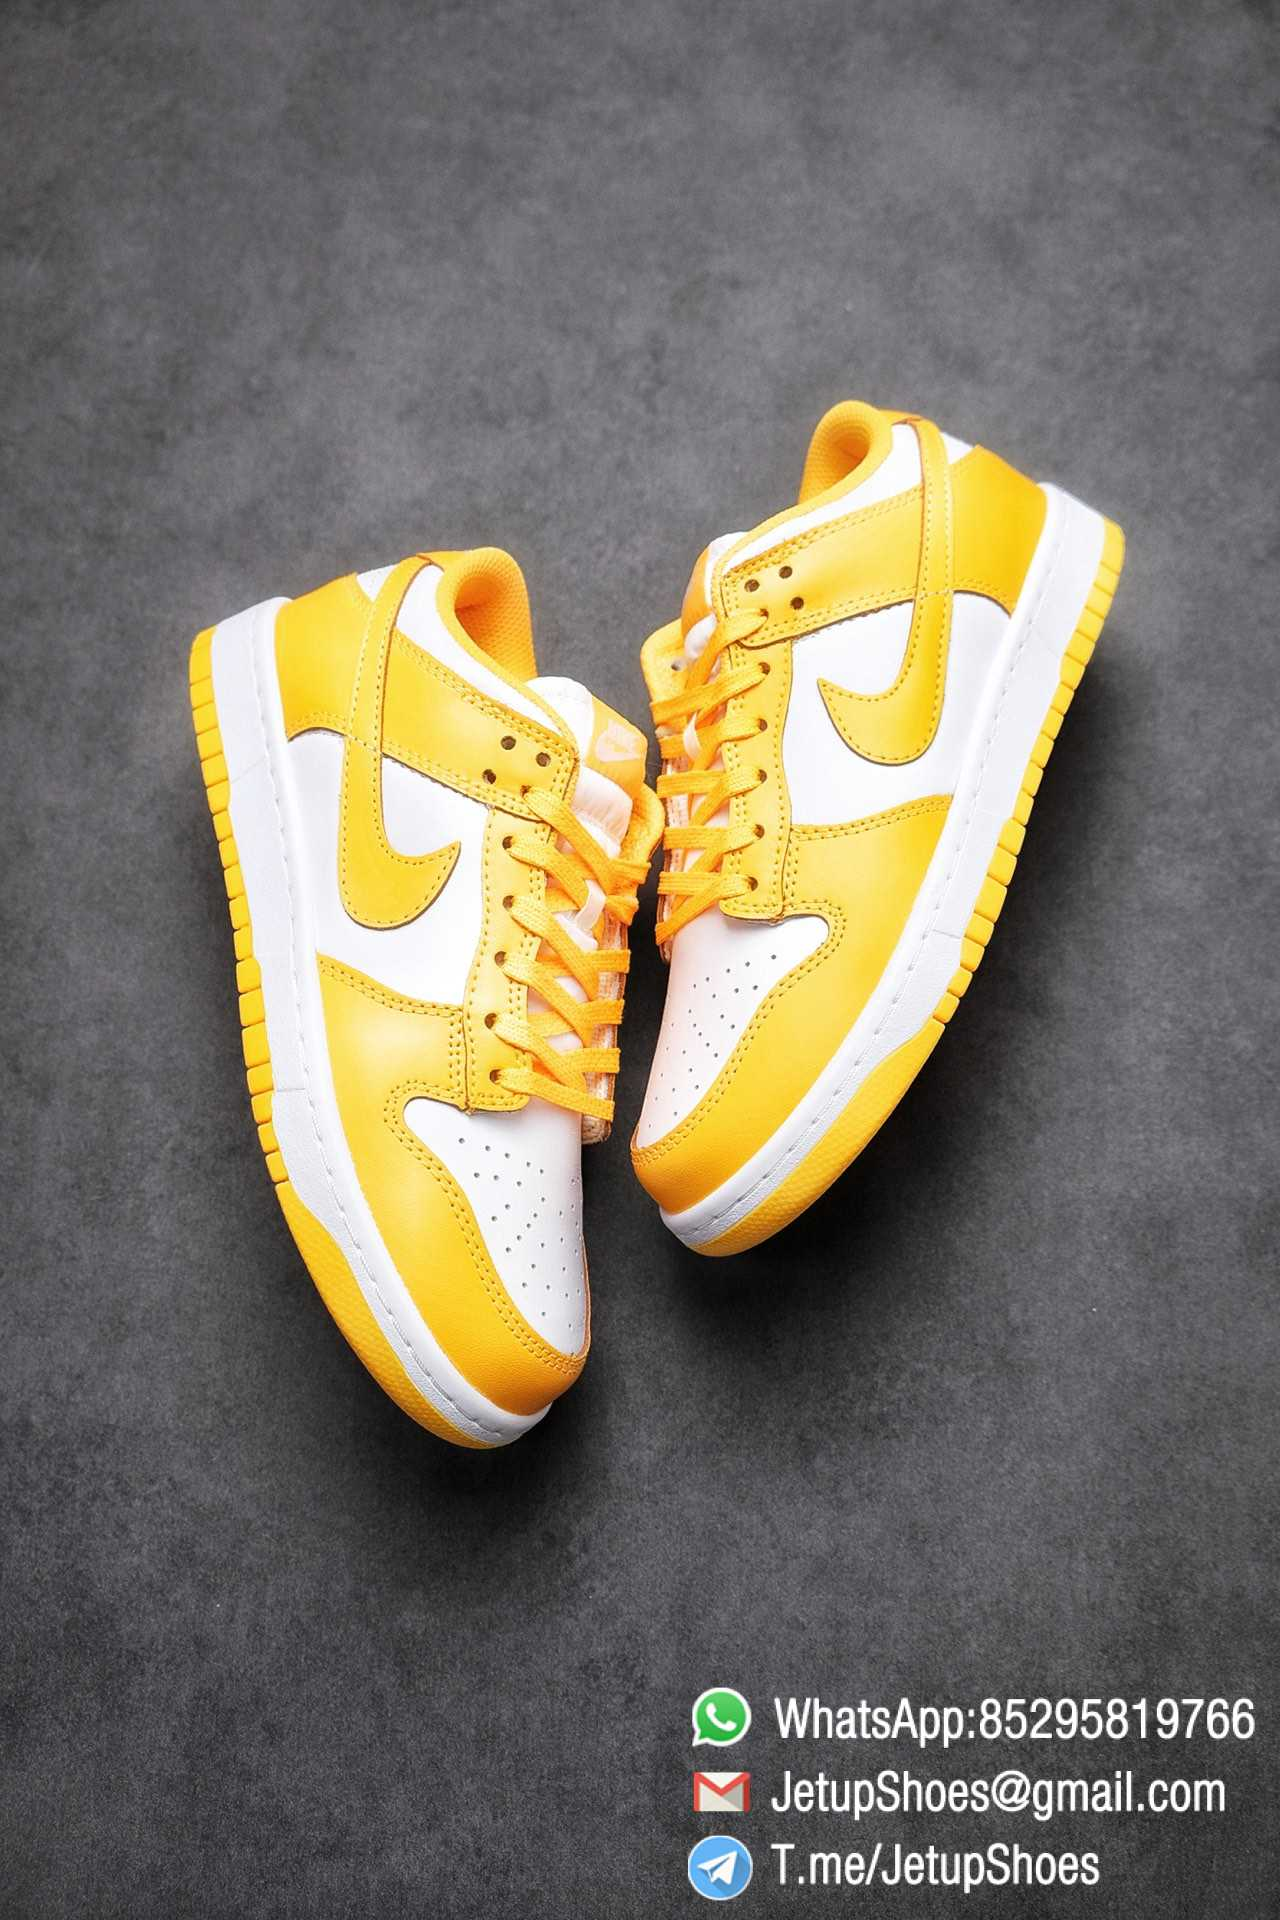 Womens Sneakers Replica Nike SB Dunk Low Laser Orange DD1503 800 Best RepSneakers 03